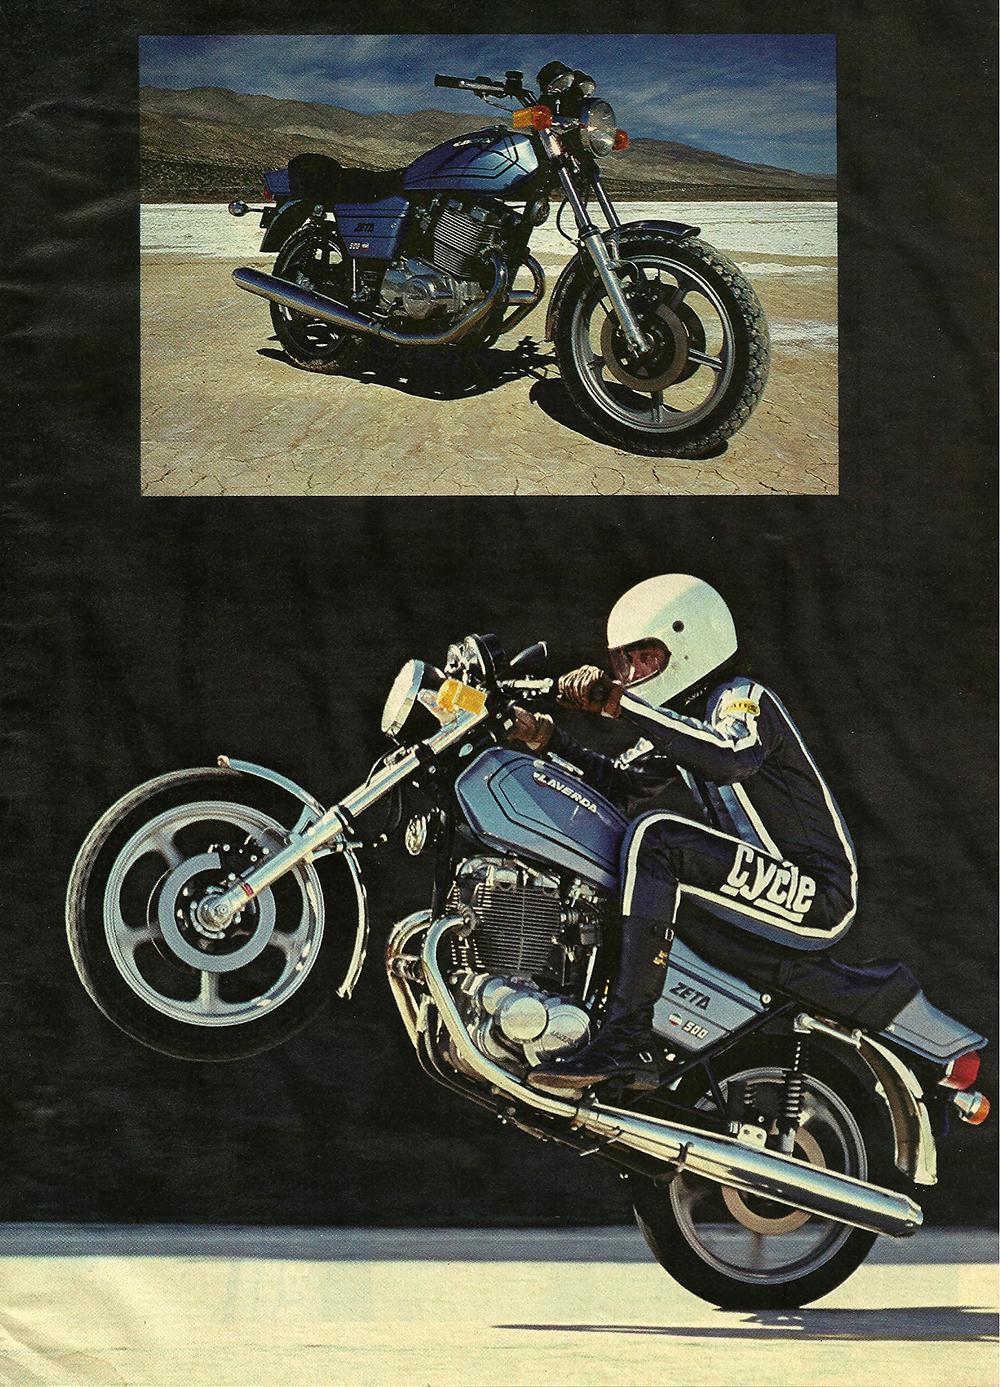 1979 Laverda 500 Zeta road test 2.jpg